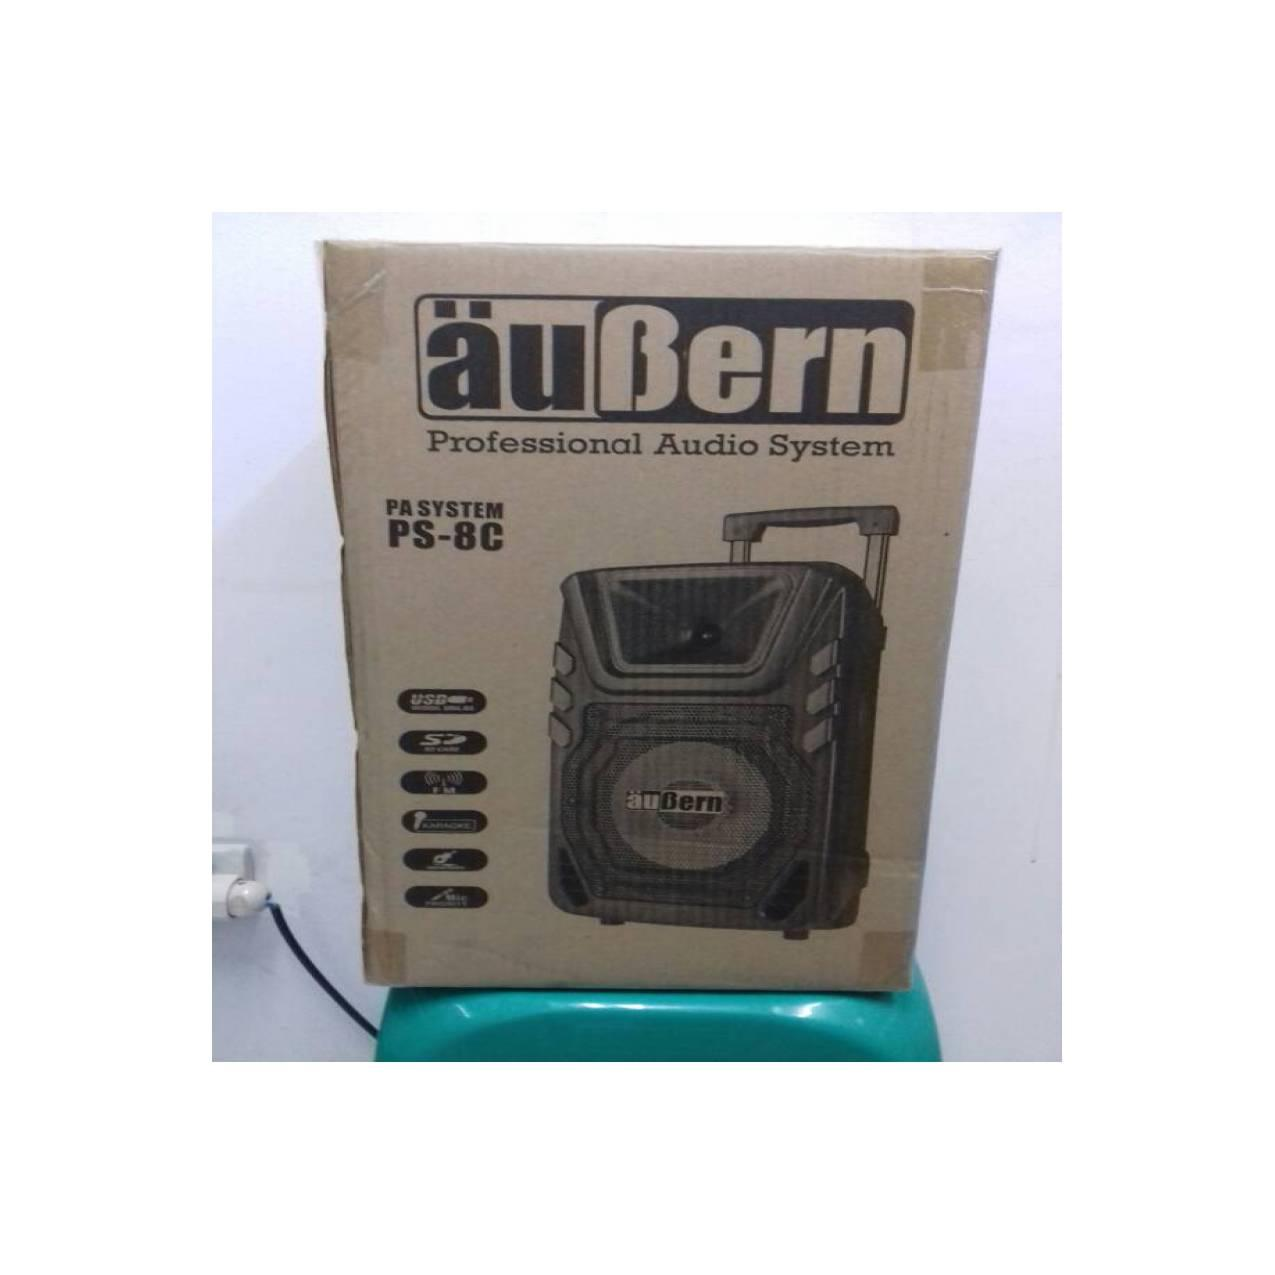 aubern PS-8 portable audio syatem